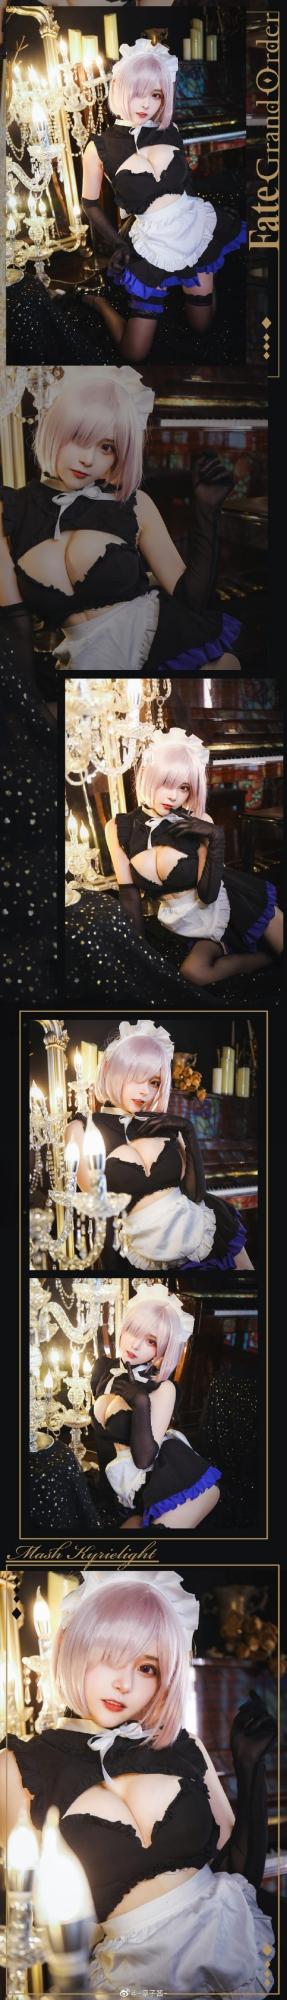 《Fate/GrandOrder》玛修女仆Cosplay【CN:凛子酱】 (8P)-第8张